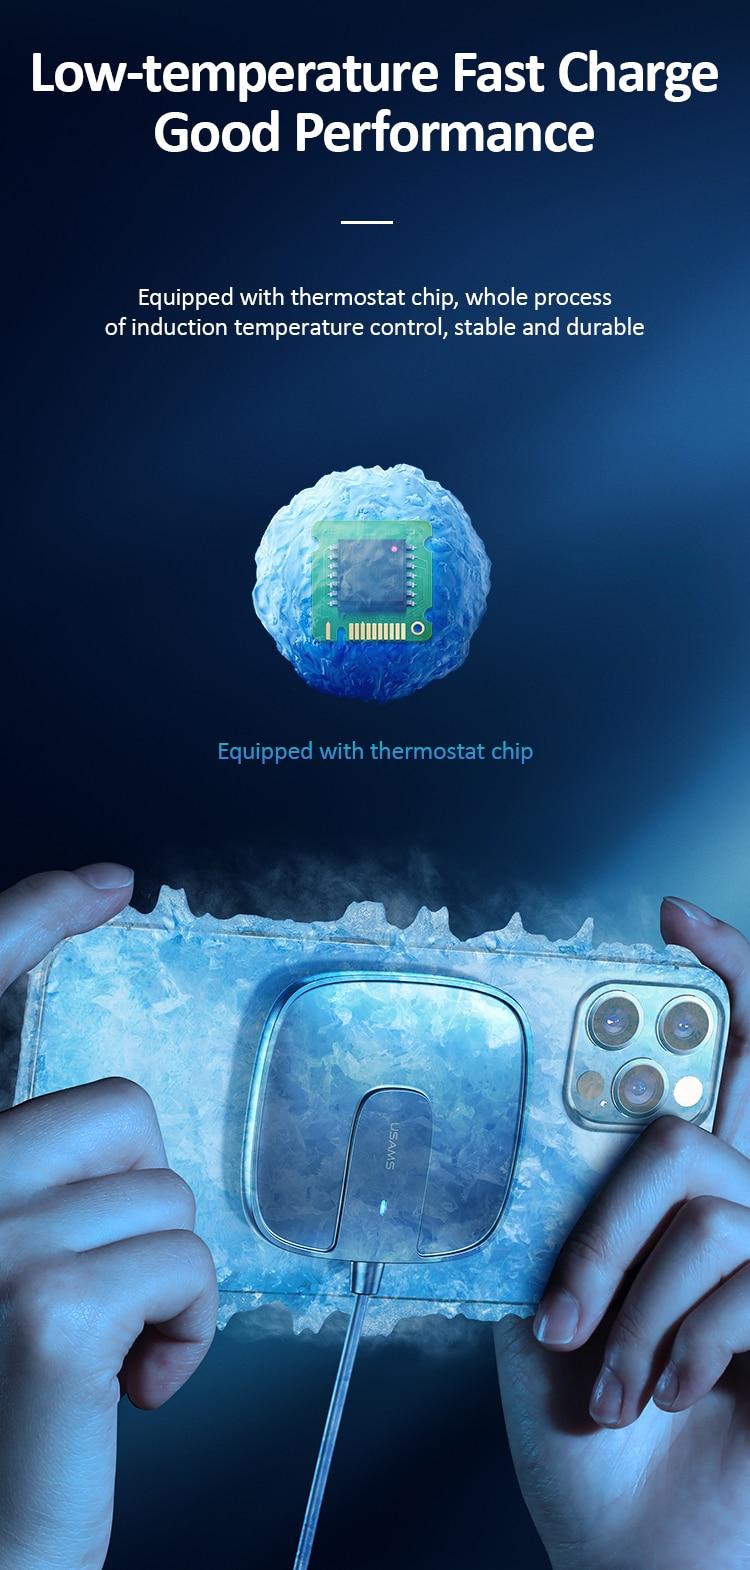 W1-苹果超薄磁吸无线快充充电器带线款-US-CD159_05